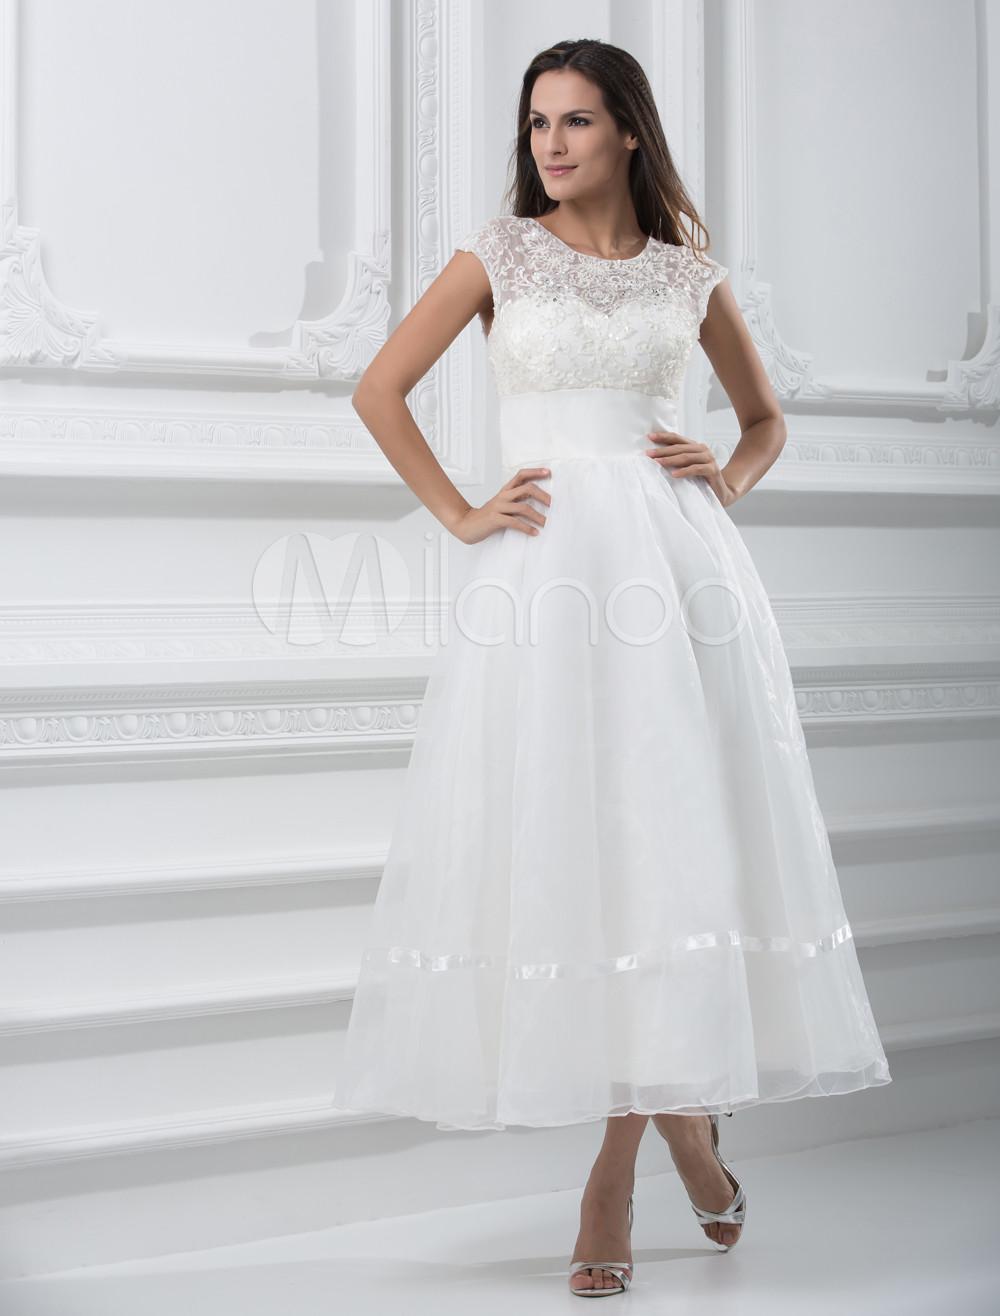 Outdoor Wedding Dresses mini wedding dress Corset Ruched Mini Length White Outdoor Wedding Dresses